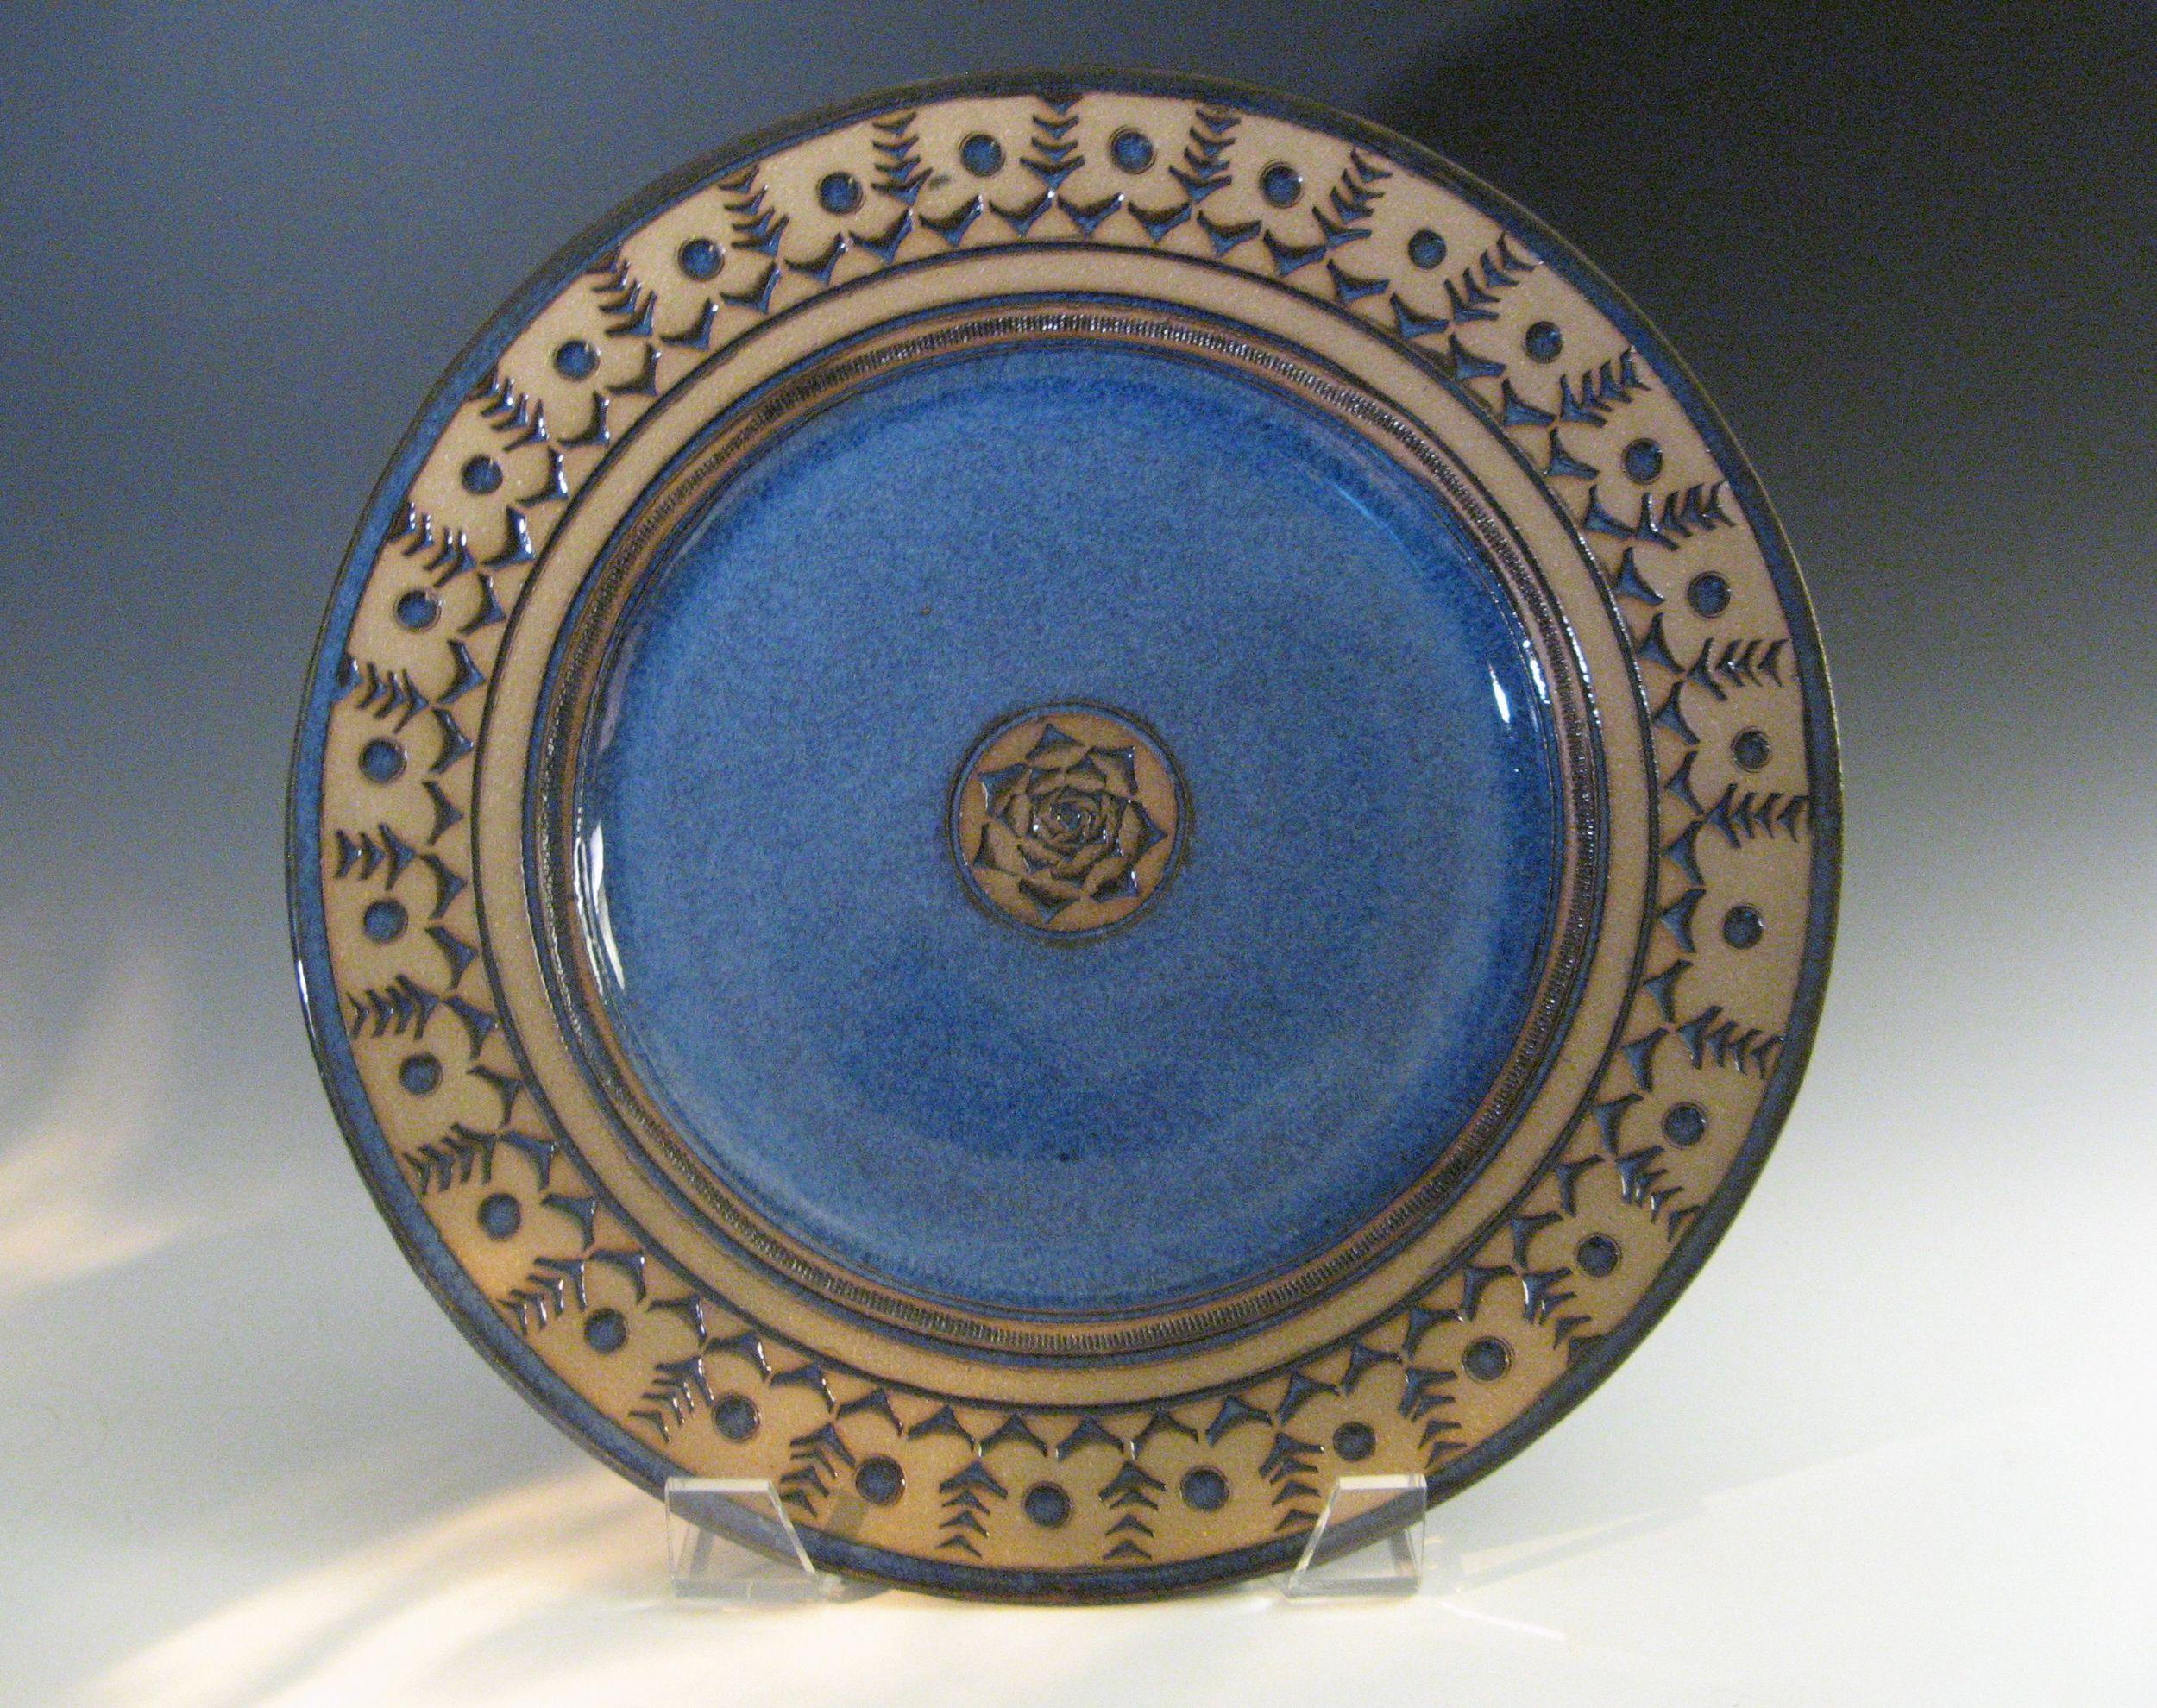 Sapphire blue serving plate